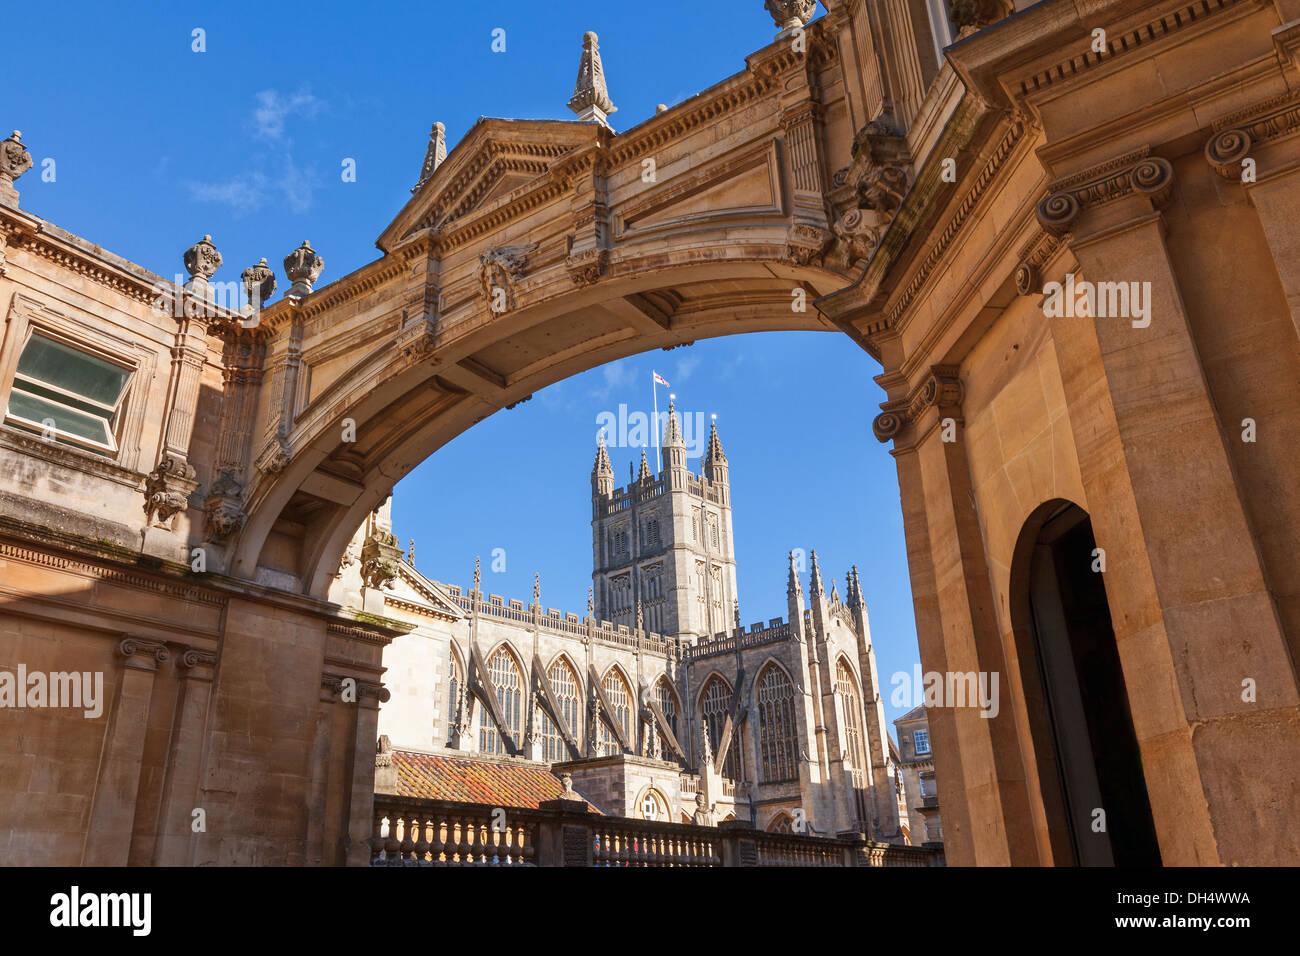 Bath Abbey Arch Stock Photos & Bath Abbey Arch Stock Images - Alamy